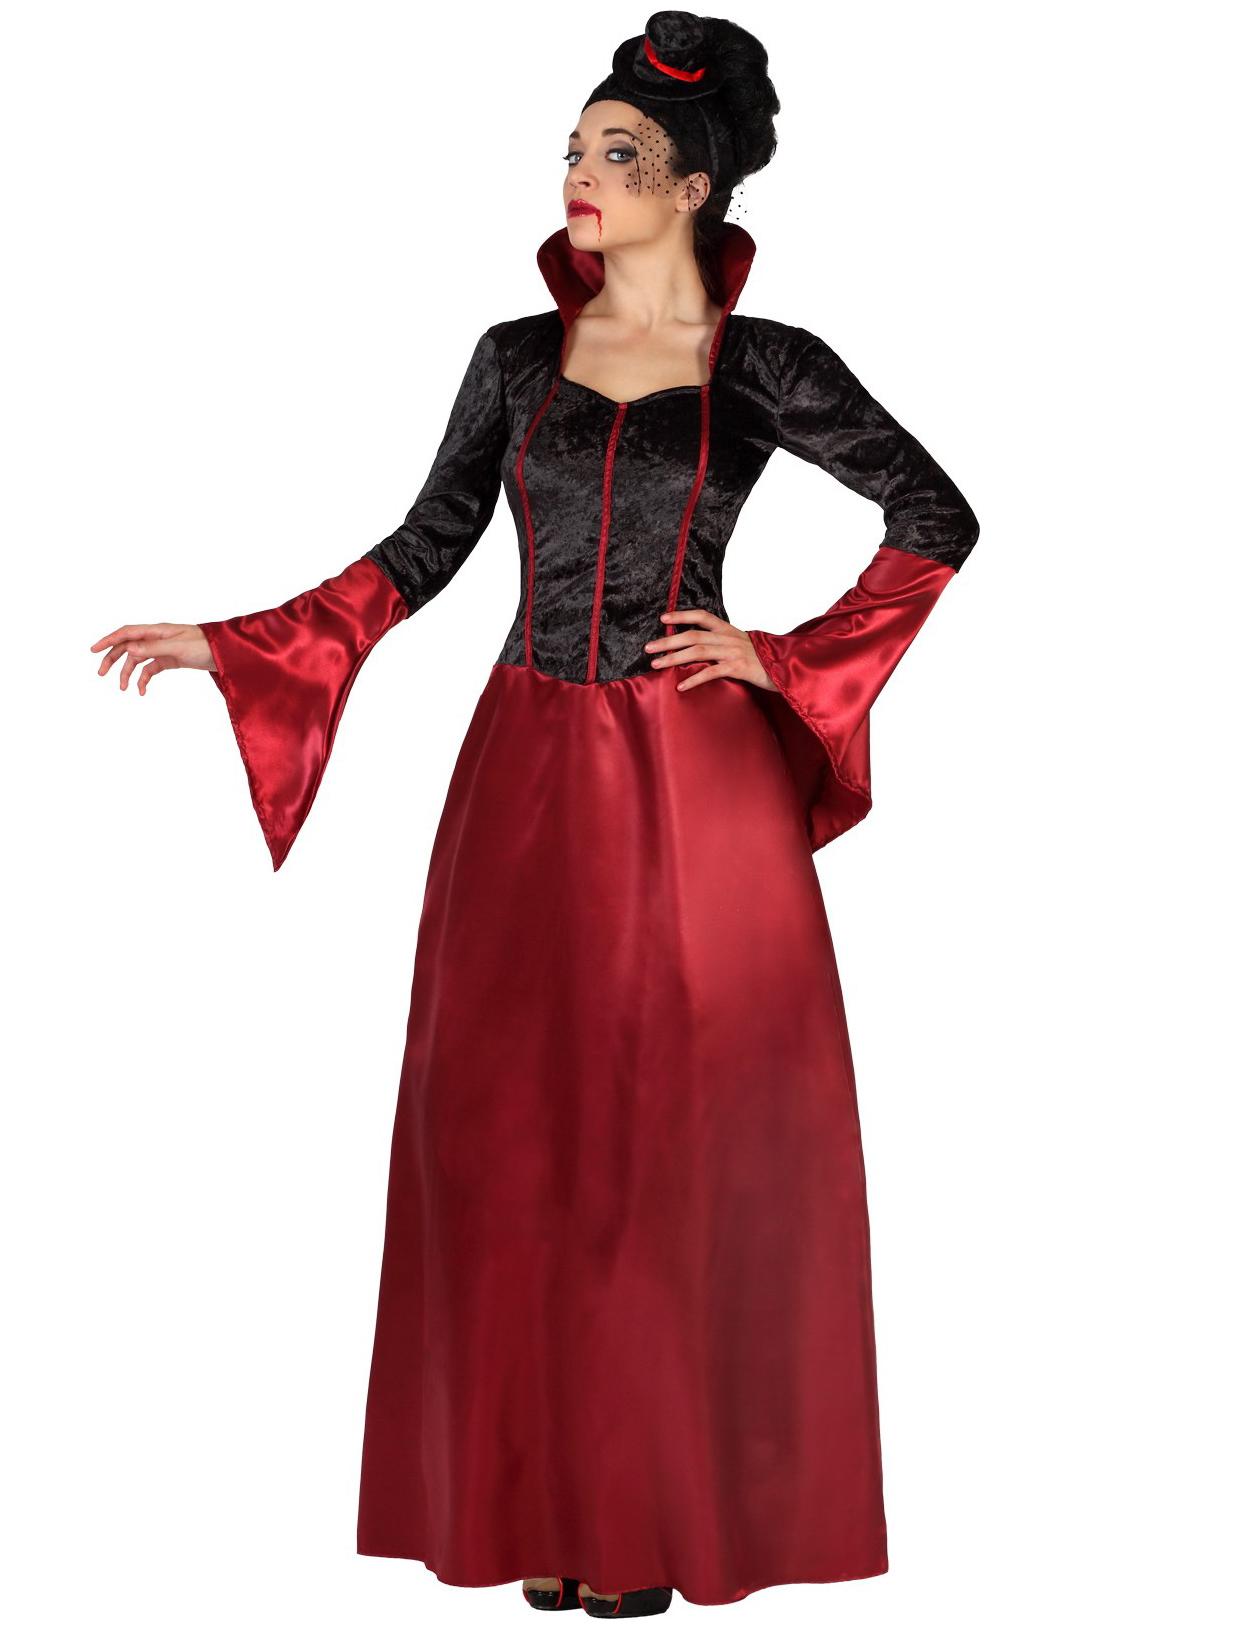 Vestiti da vampiri per adulti per Halloween - Vegaoo.it 92a4e6efea3